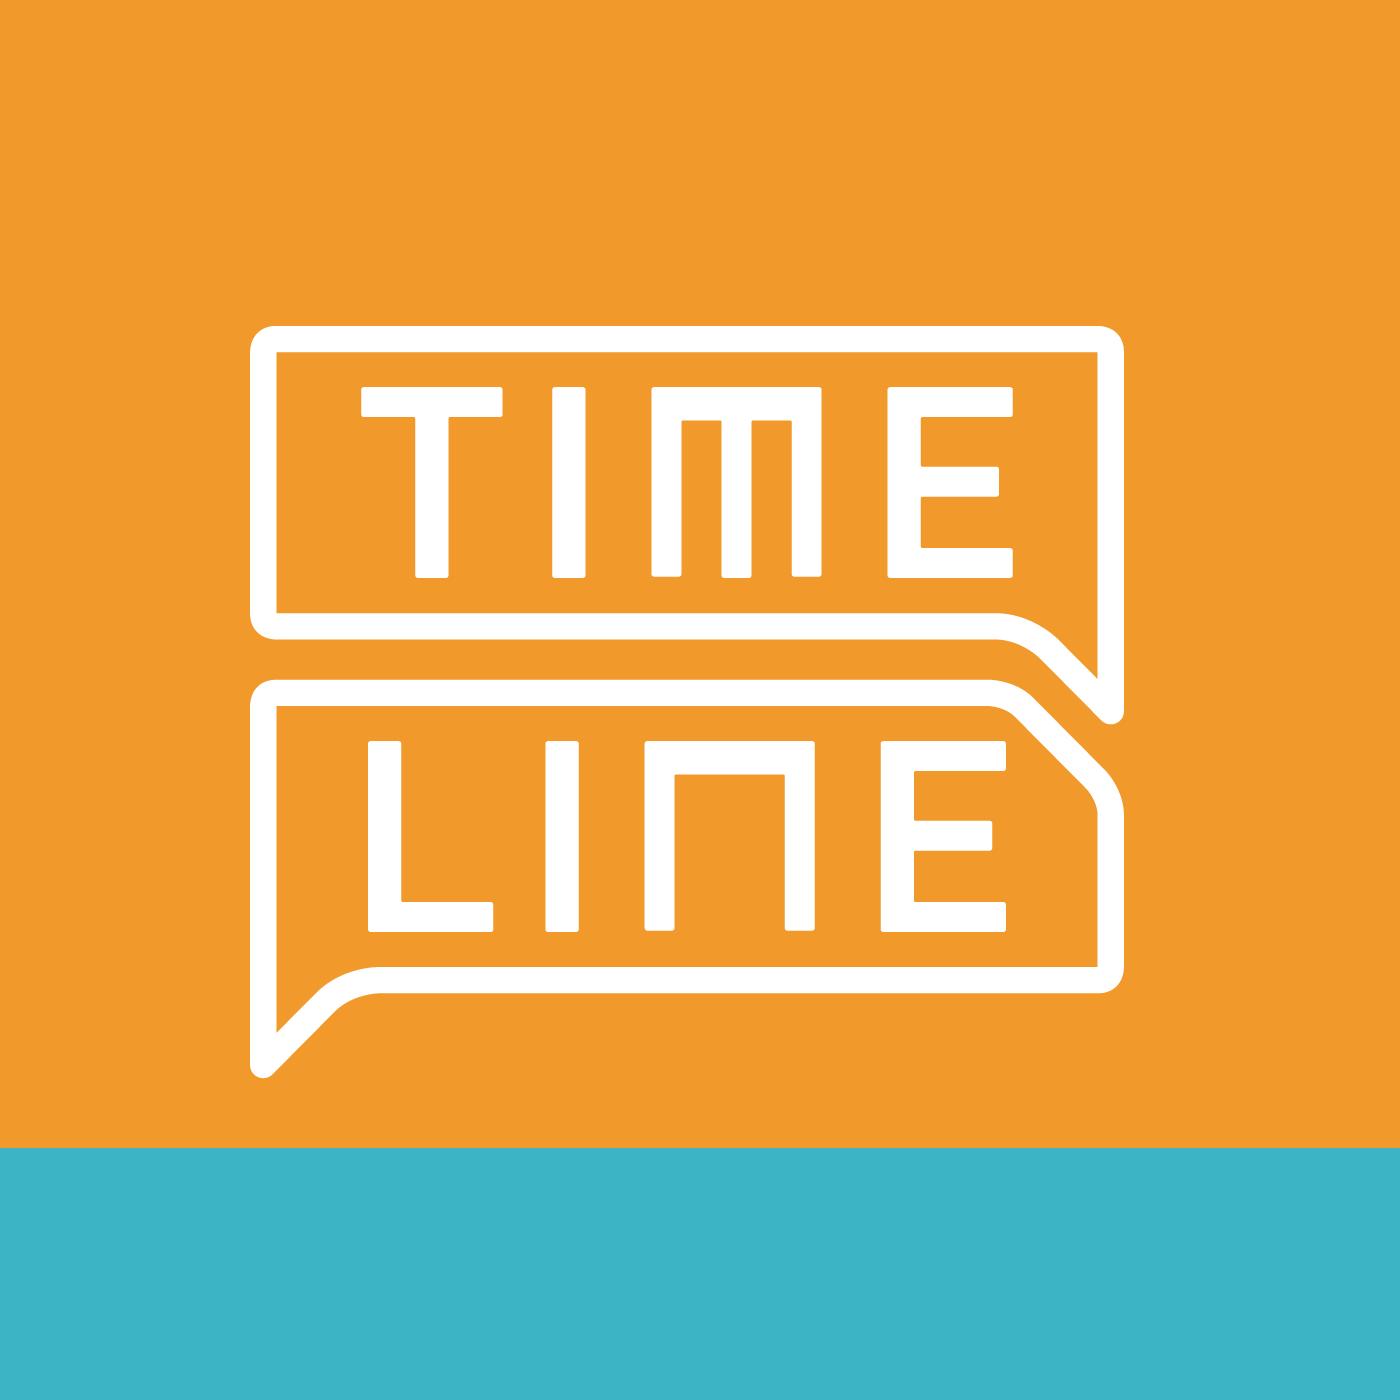 Timeline Gaúcha 11/12/2017